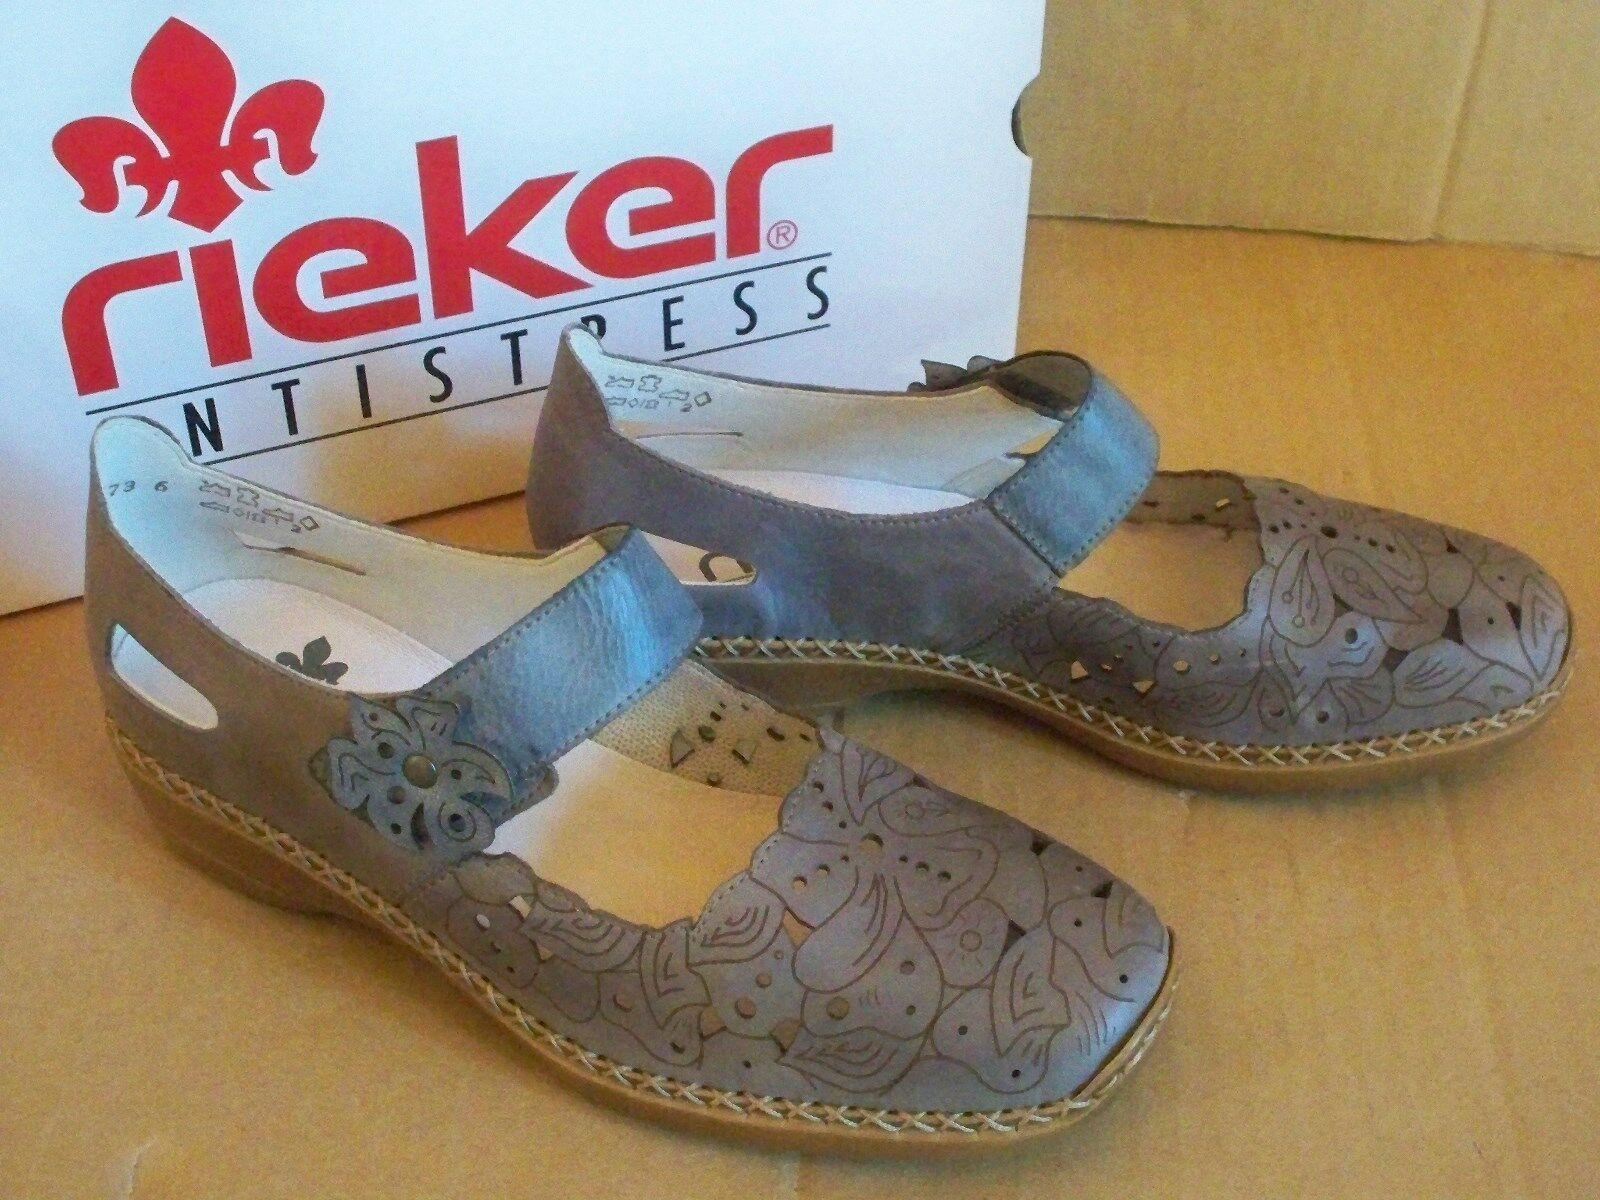 Rieker  ANTISTRESS Slipper/Trotteur 41358-12   blau-grau Gr 38